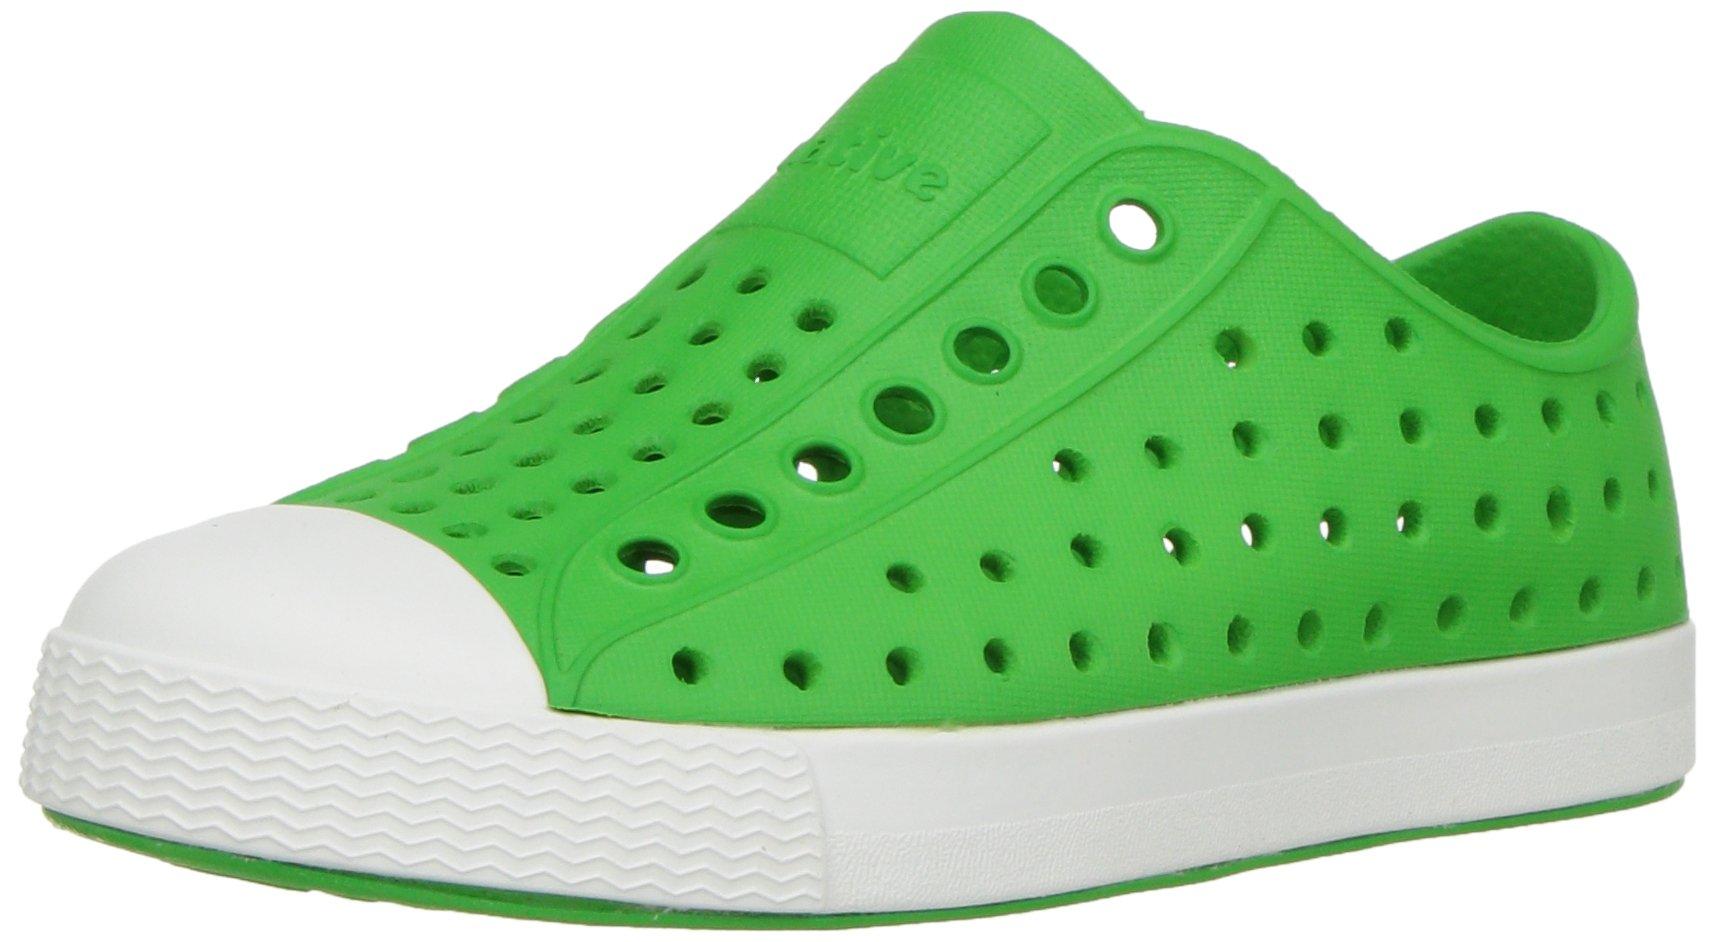 Native Kids Unisex-baby Jefferson Water Proof Shoes, Grasshopper Green/Shell White, 5 Medium US Toddler